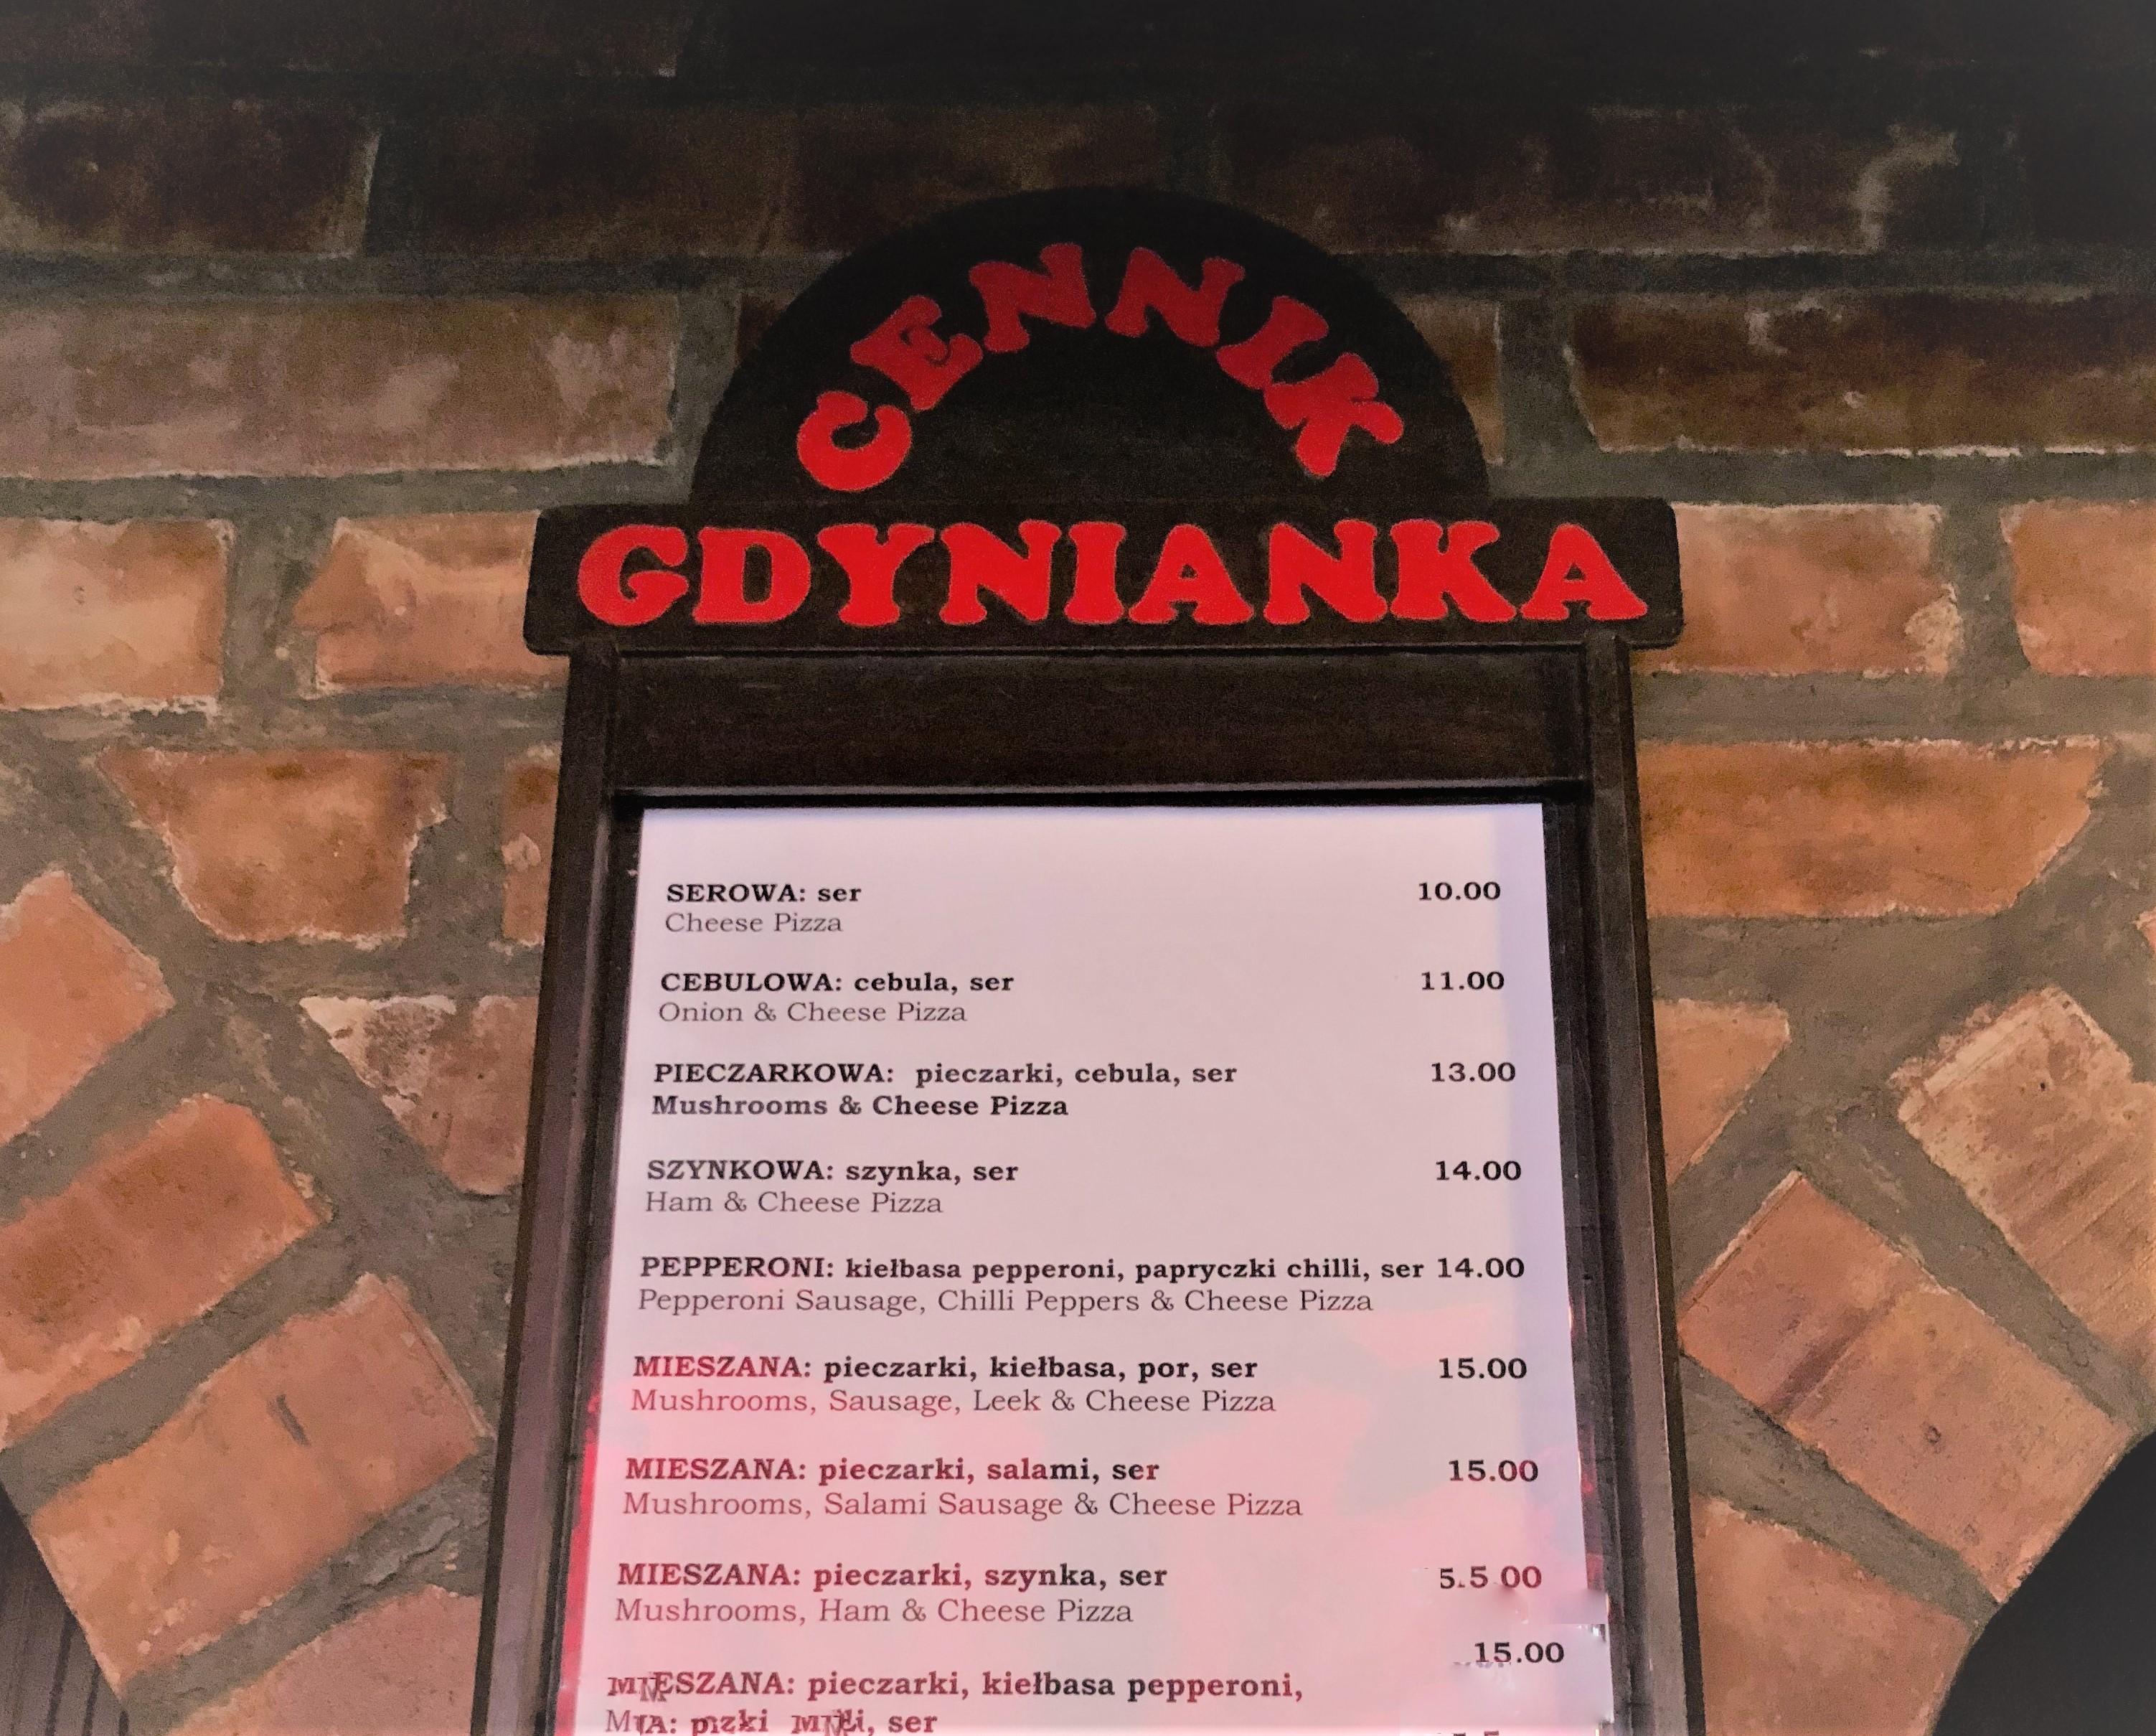 Pulchna Gdynianka